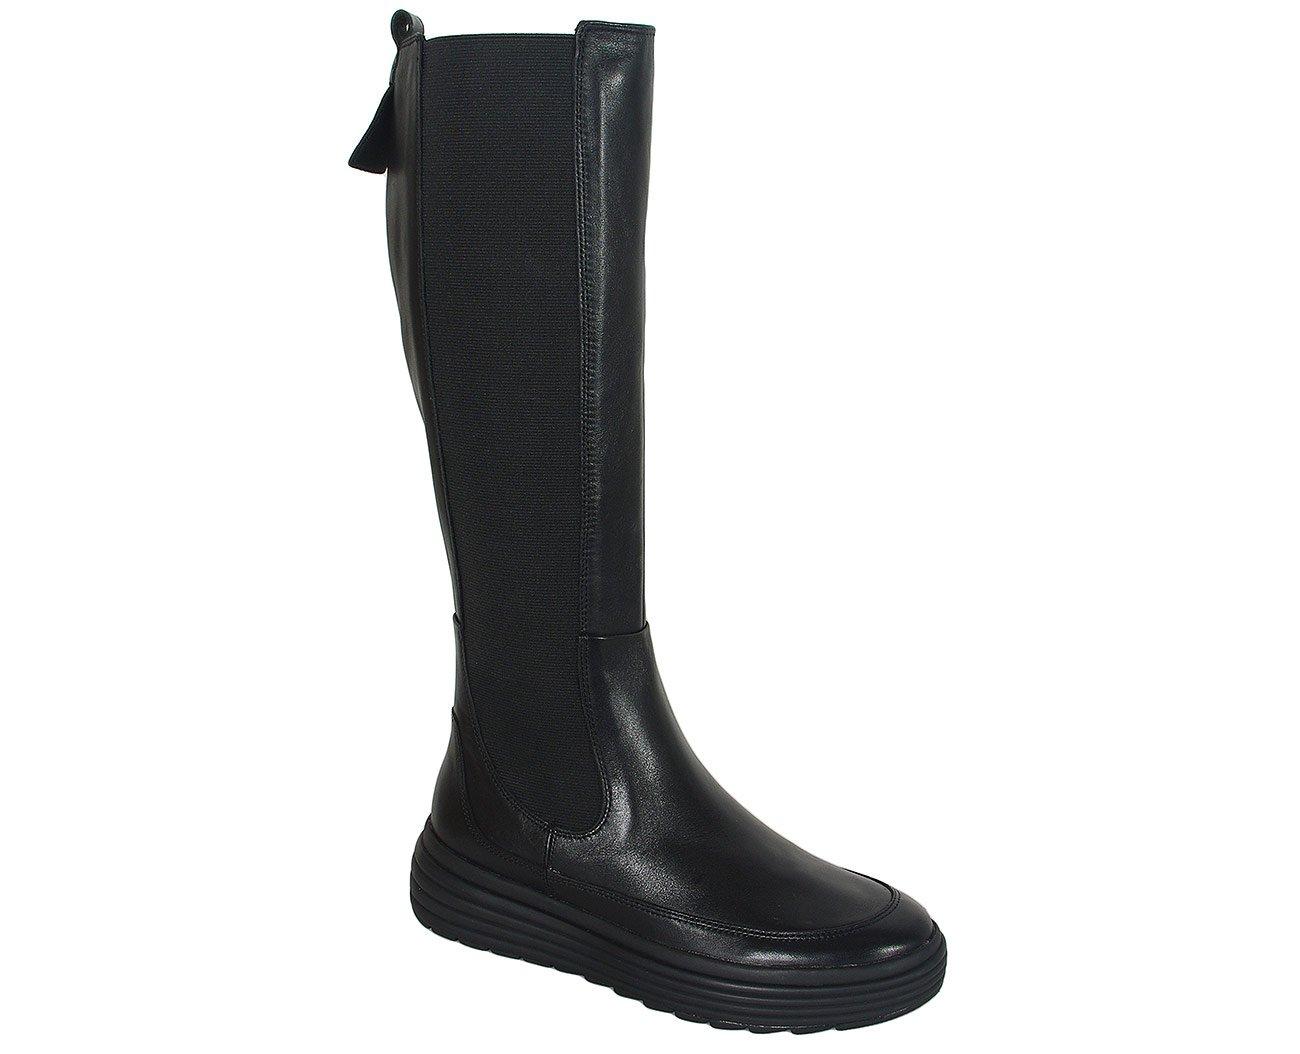 Geox Phaolae F kozaki nappa black boots casual sport